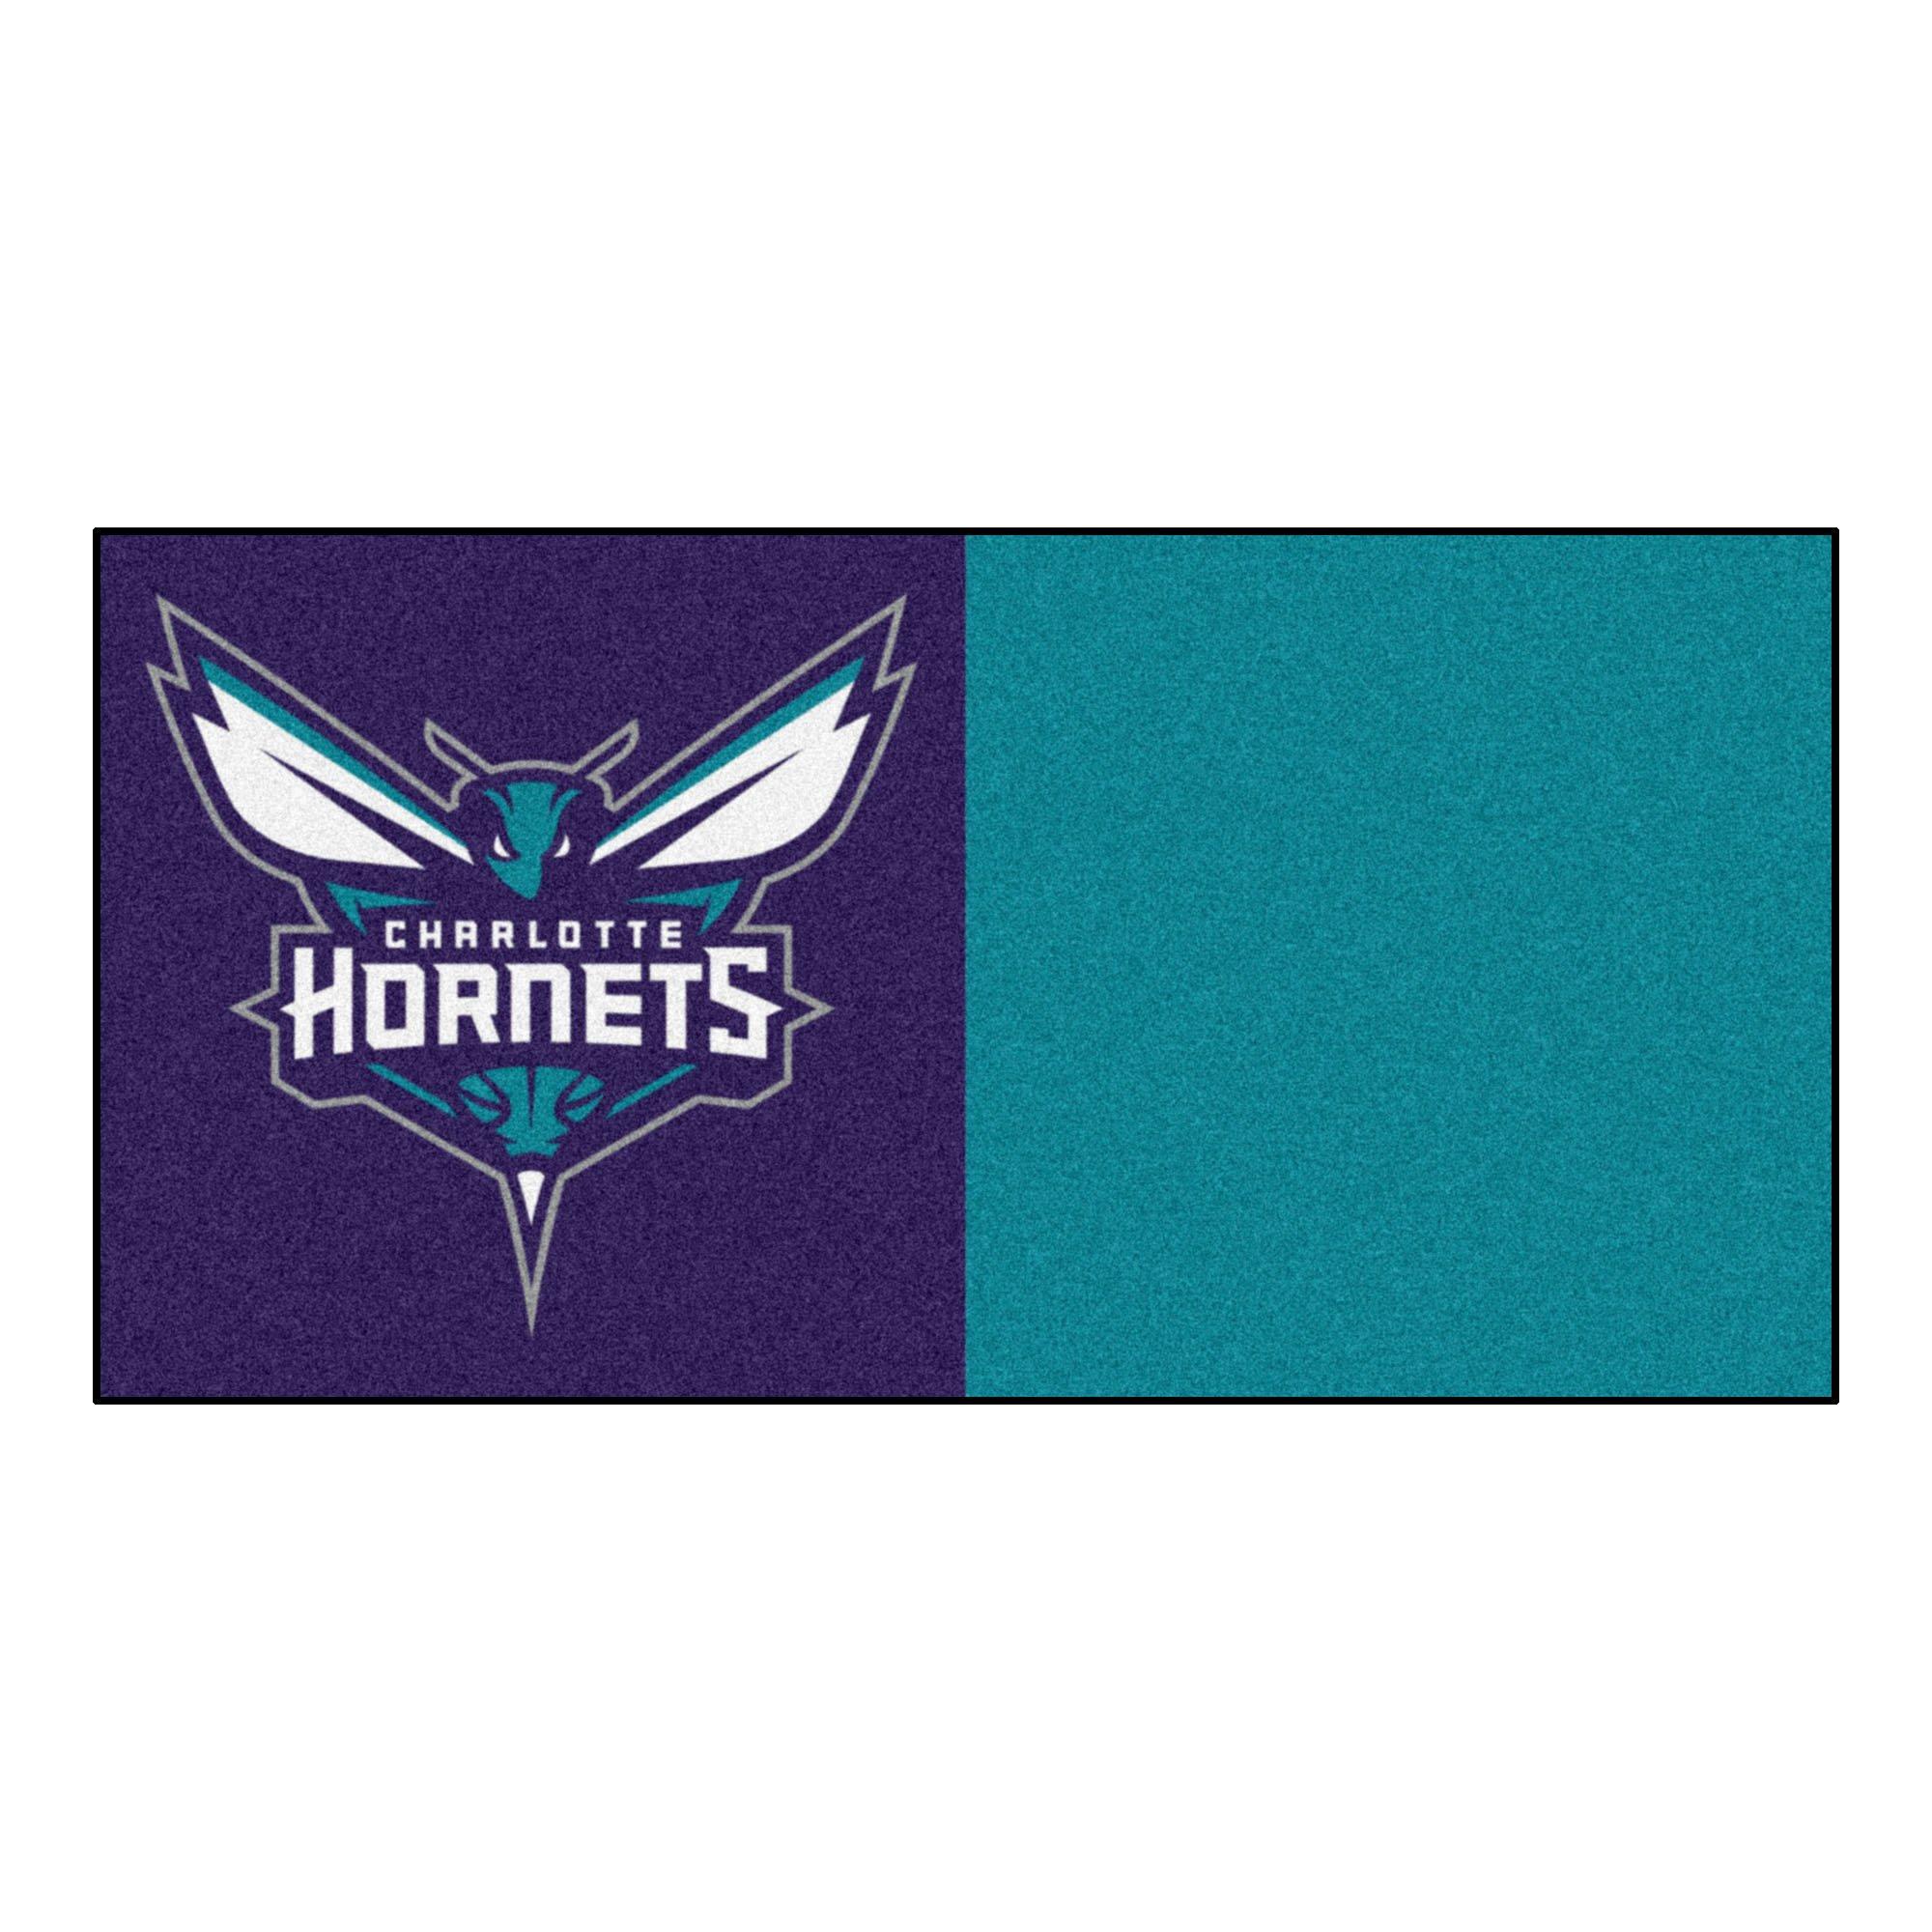 FANMATS NBA Charlotte Hornets Nylon Face Team Carpet Tiles by Fanmats